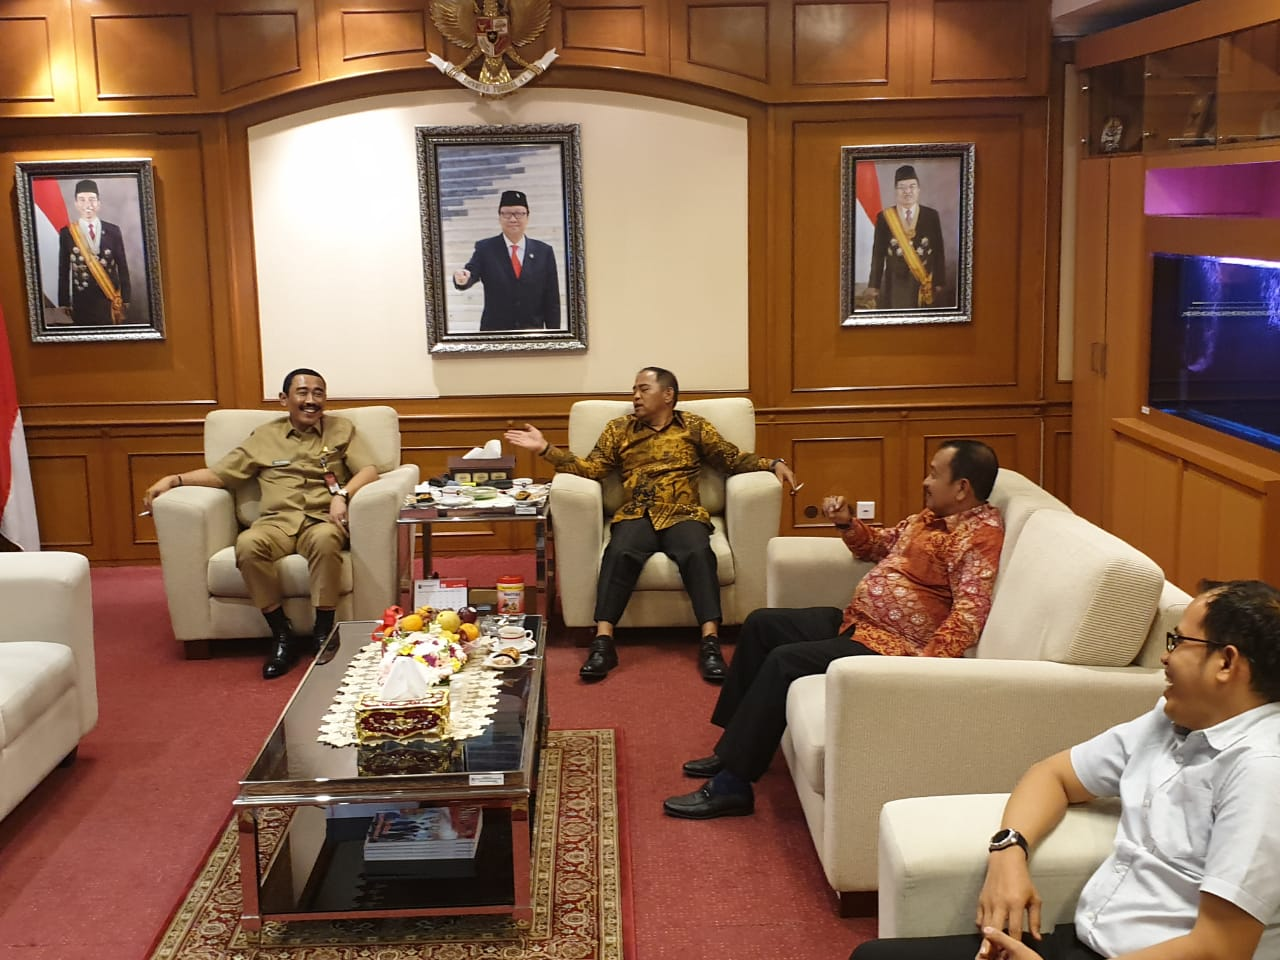 DPRD Pasangkayu Getol Perjuangkan Penyelesaian Tapal Batas